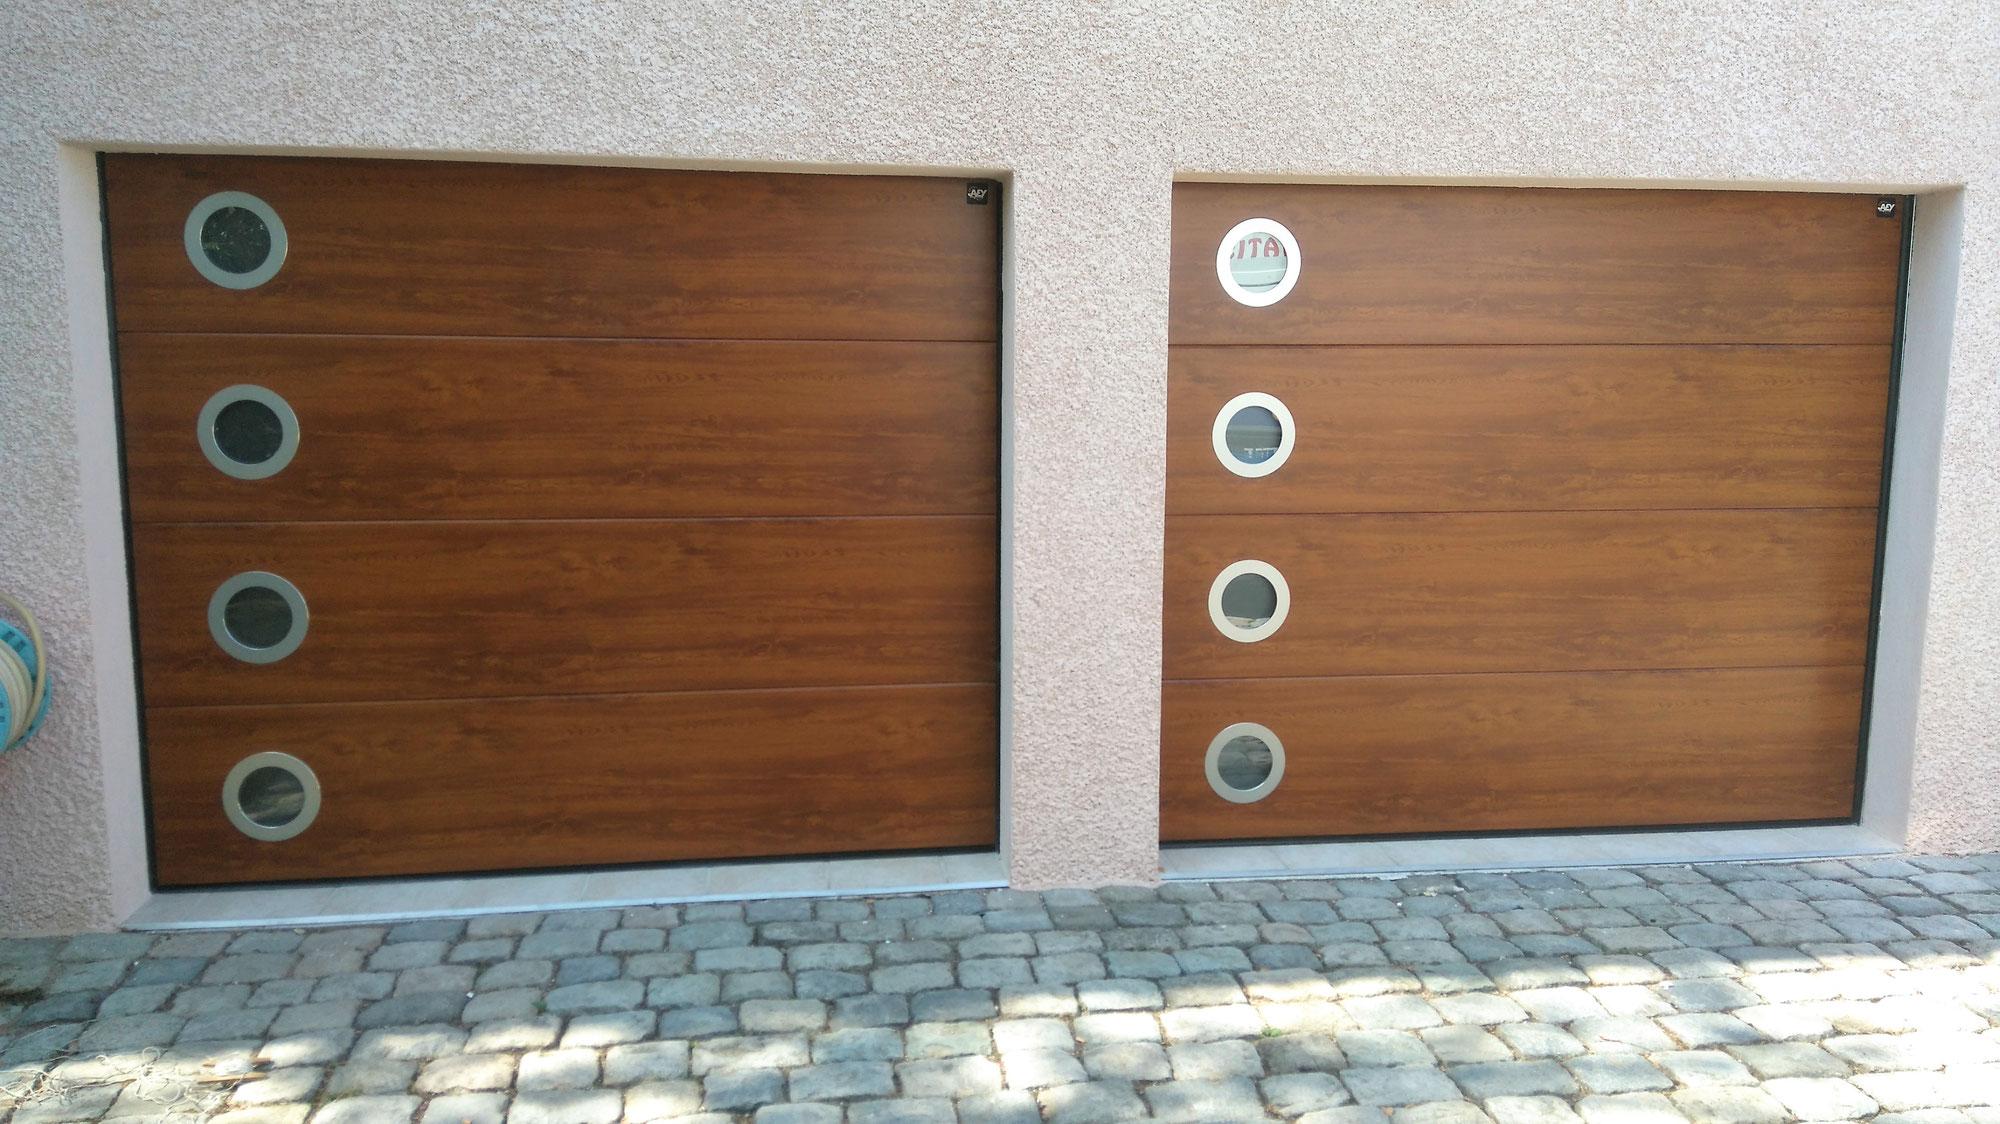 fabrication porte de garage en bois portes de garage sarl bois cyril fabricant installateur